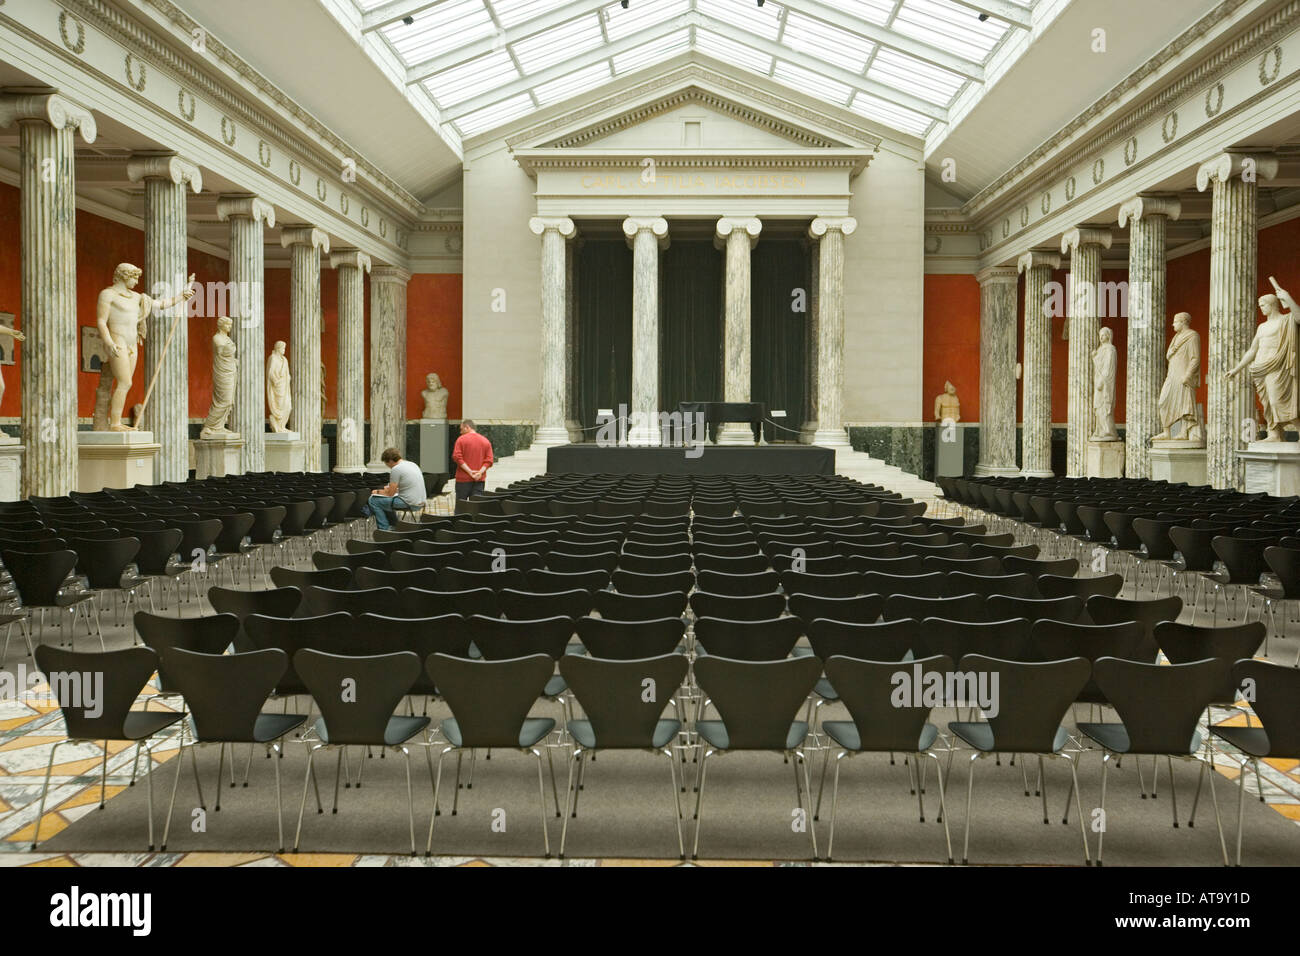 Copenhagen Denmark Ny Carlsberg Glyptotek The Concert Hall lined with Roman statuary - Stock Image